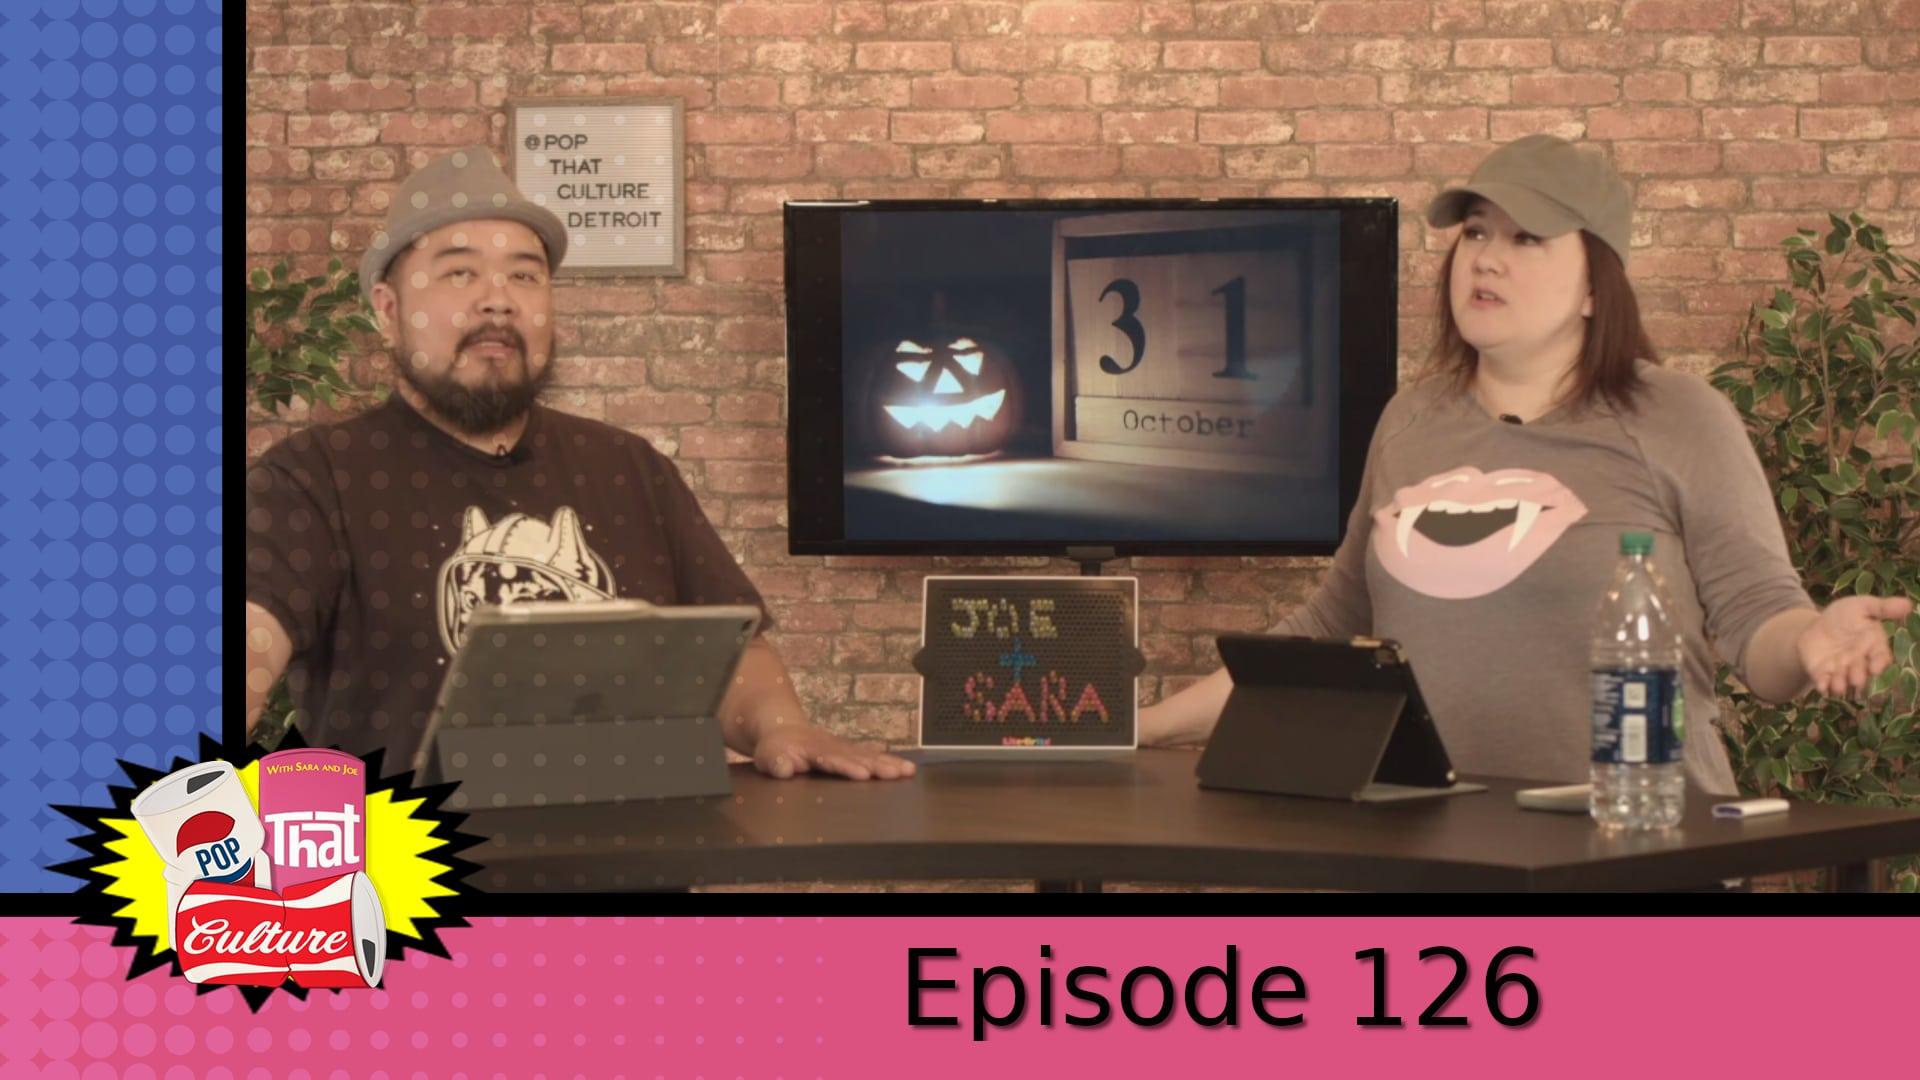 Pop That Culture - Episode 126